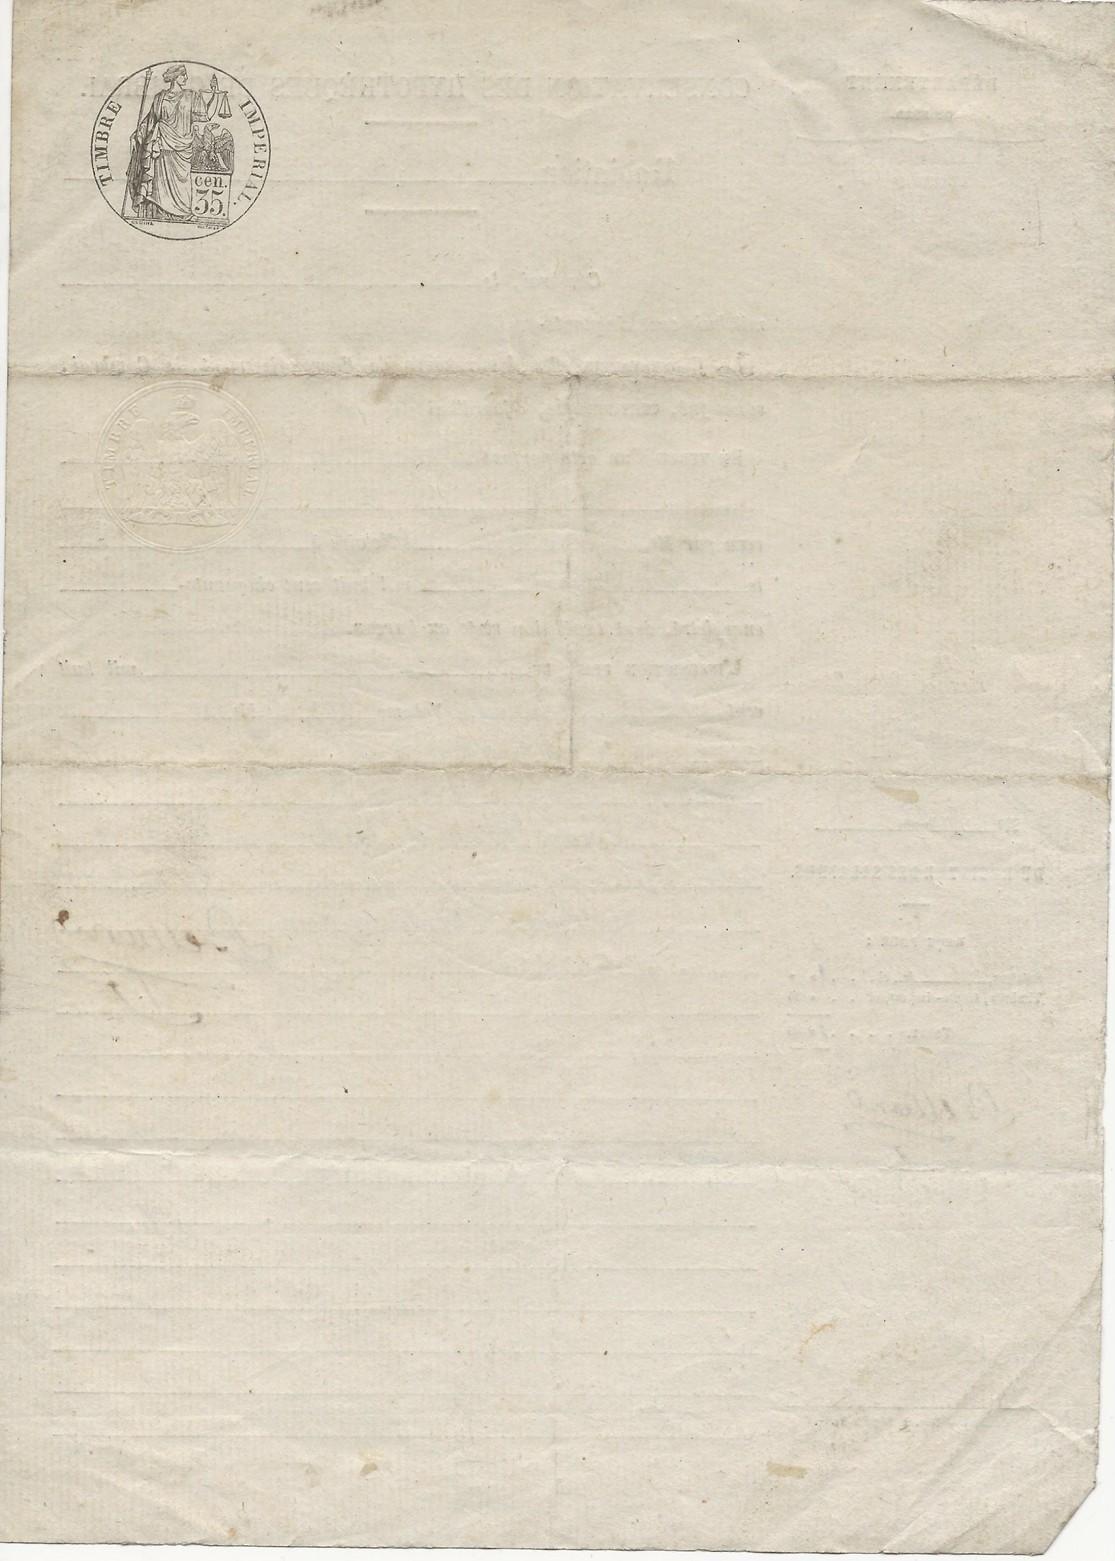 1859 main levee hypotheque desire jospin louis leger 002